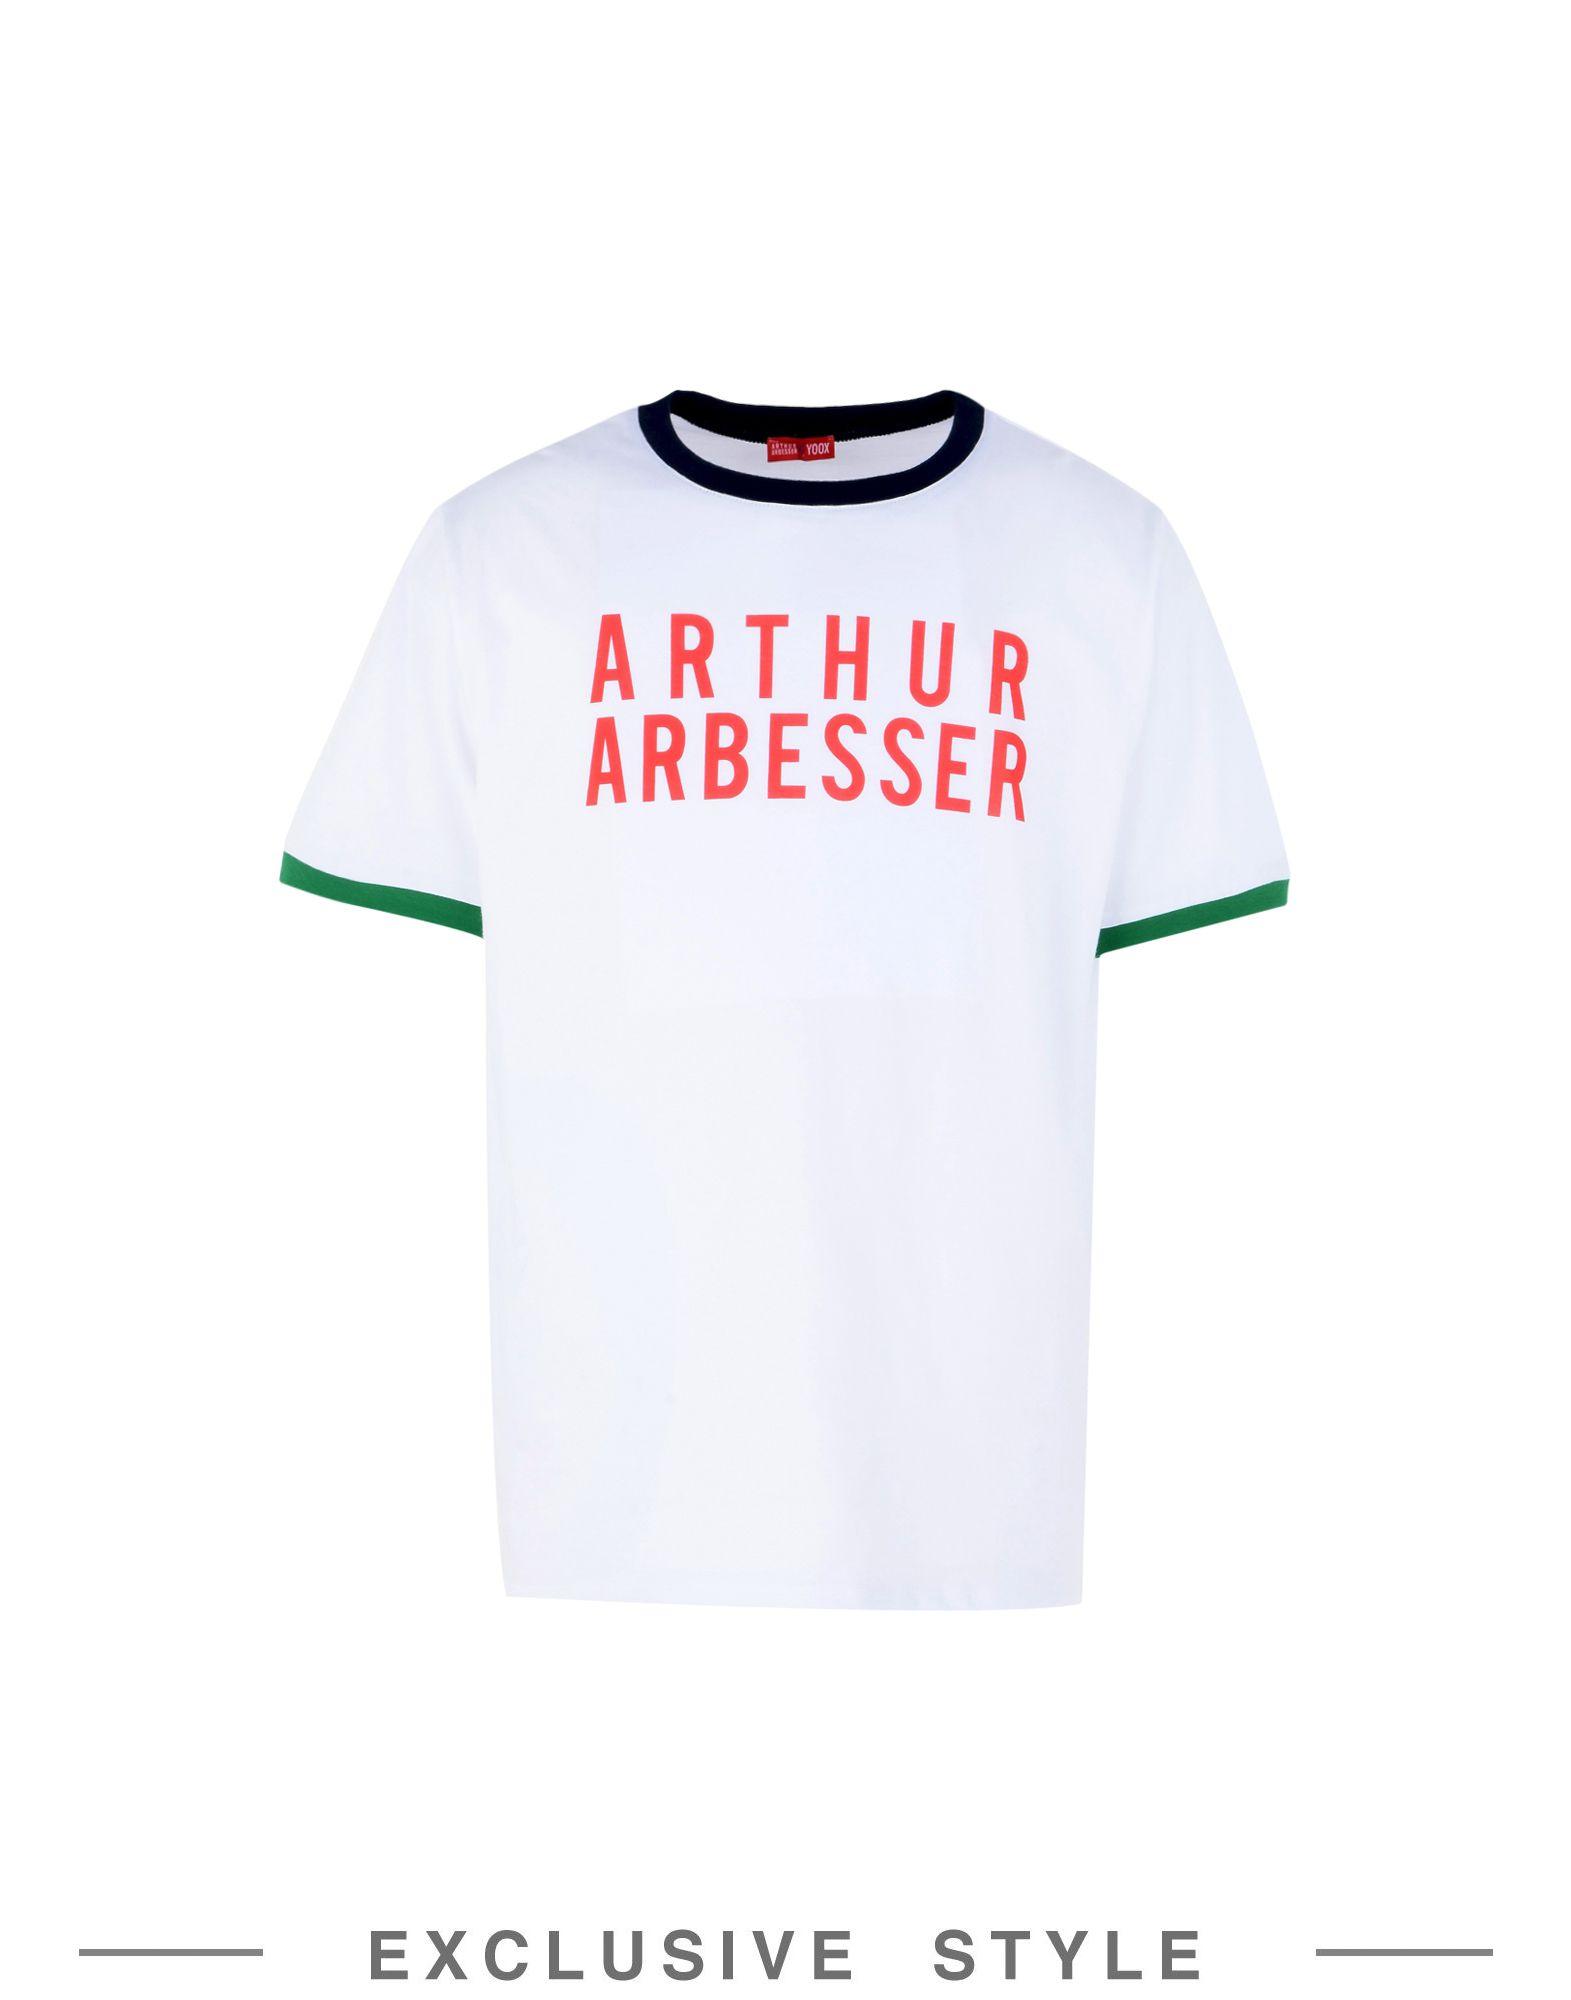 ARTHUR ARBESSER x YOOX Футболка